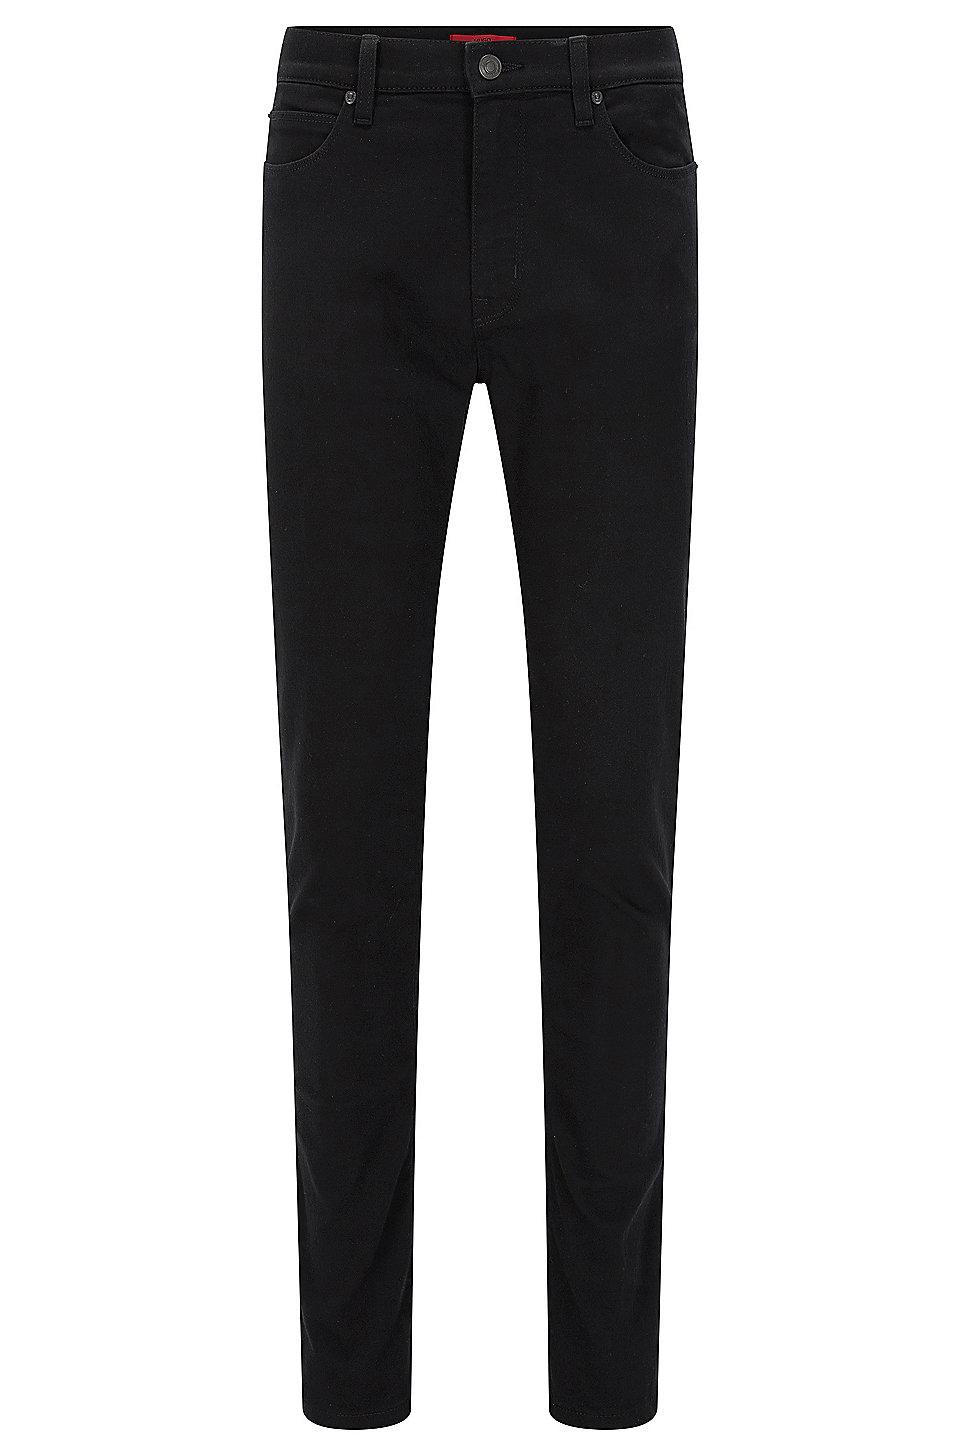 HUGO BOSS Jeans Skinny Fit en denim stretch coldblack? z3T7y9